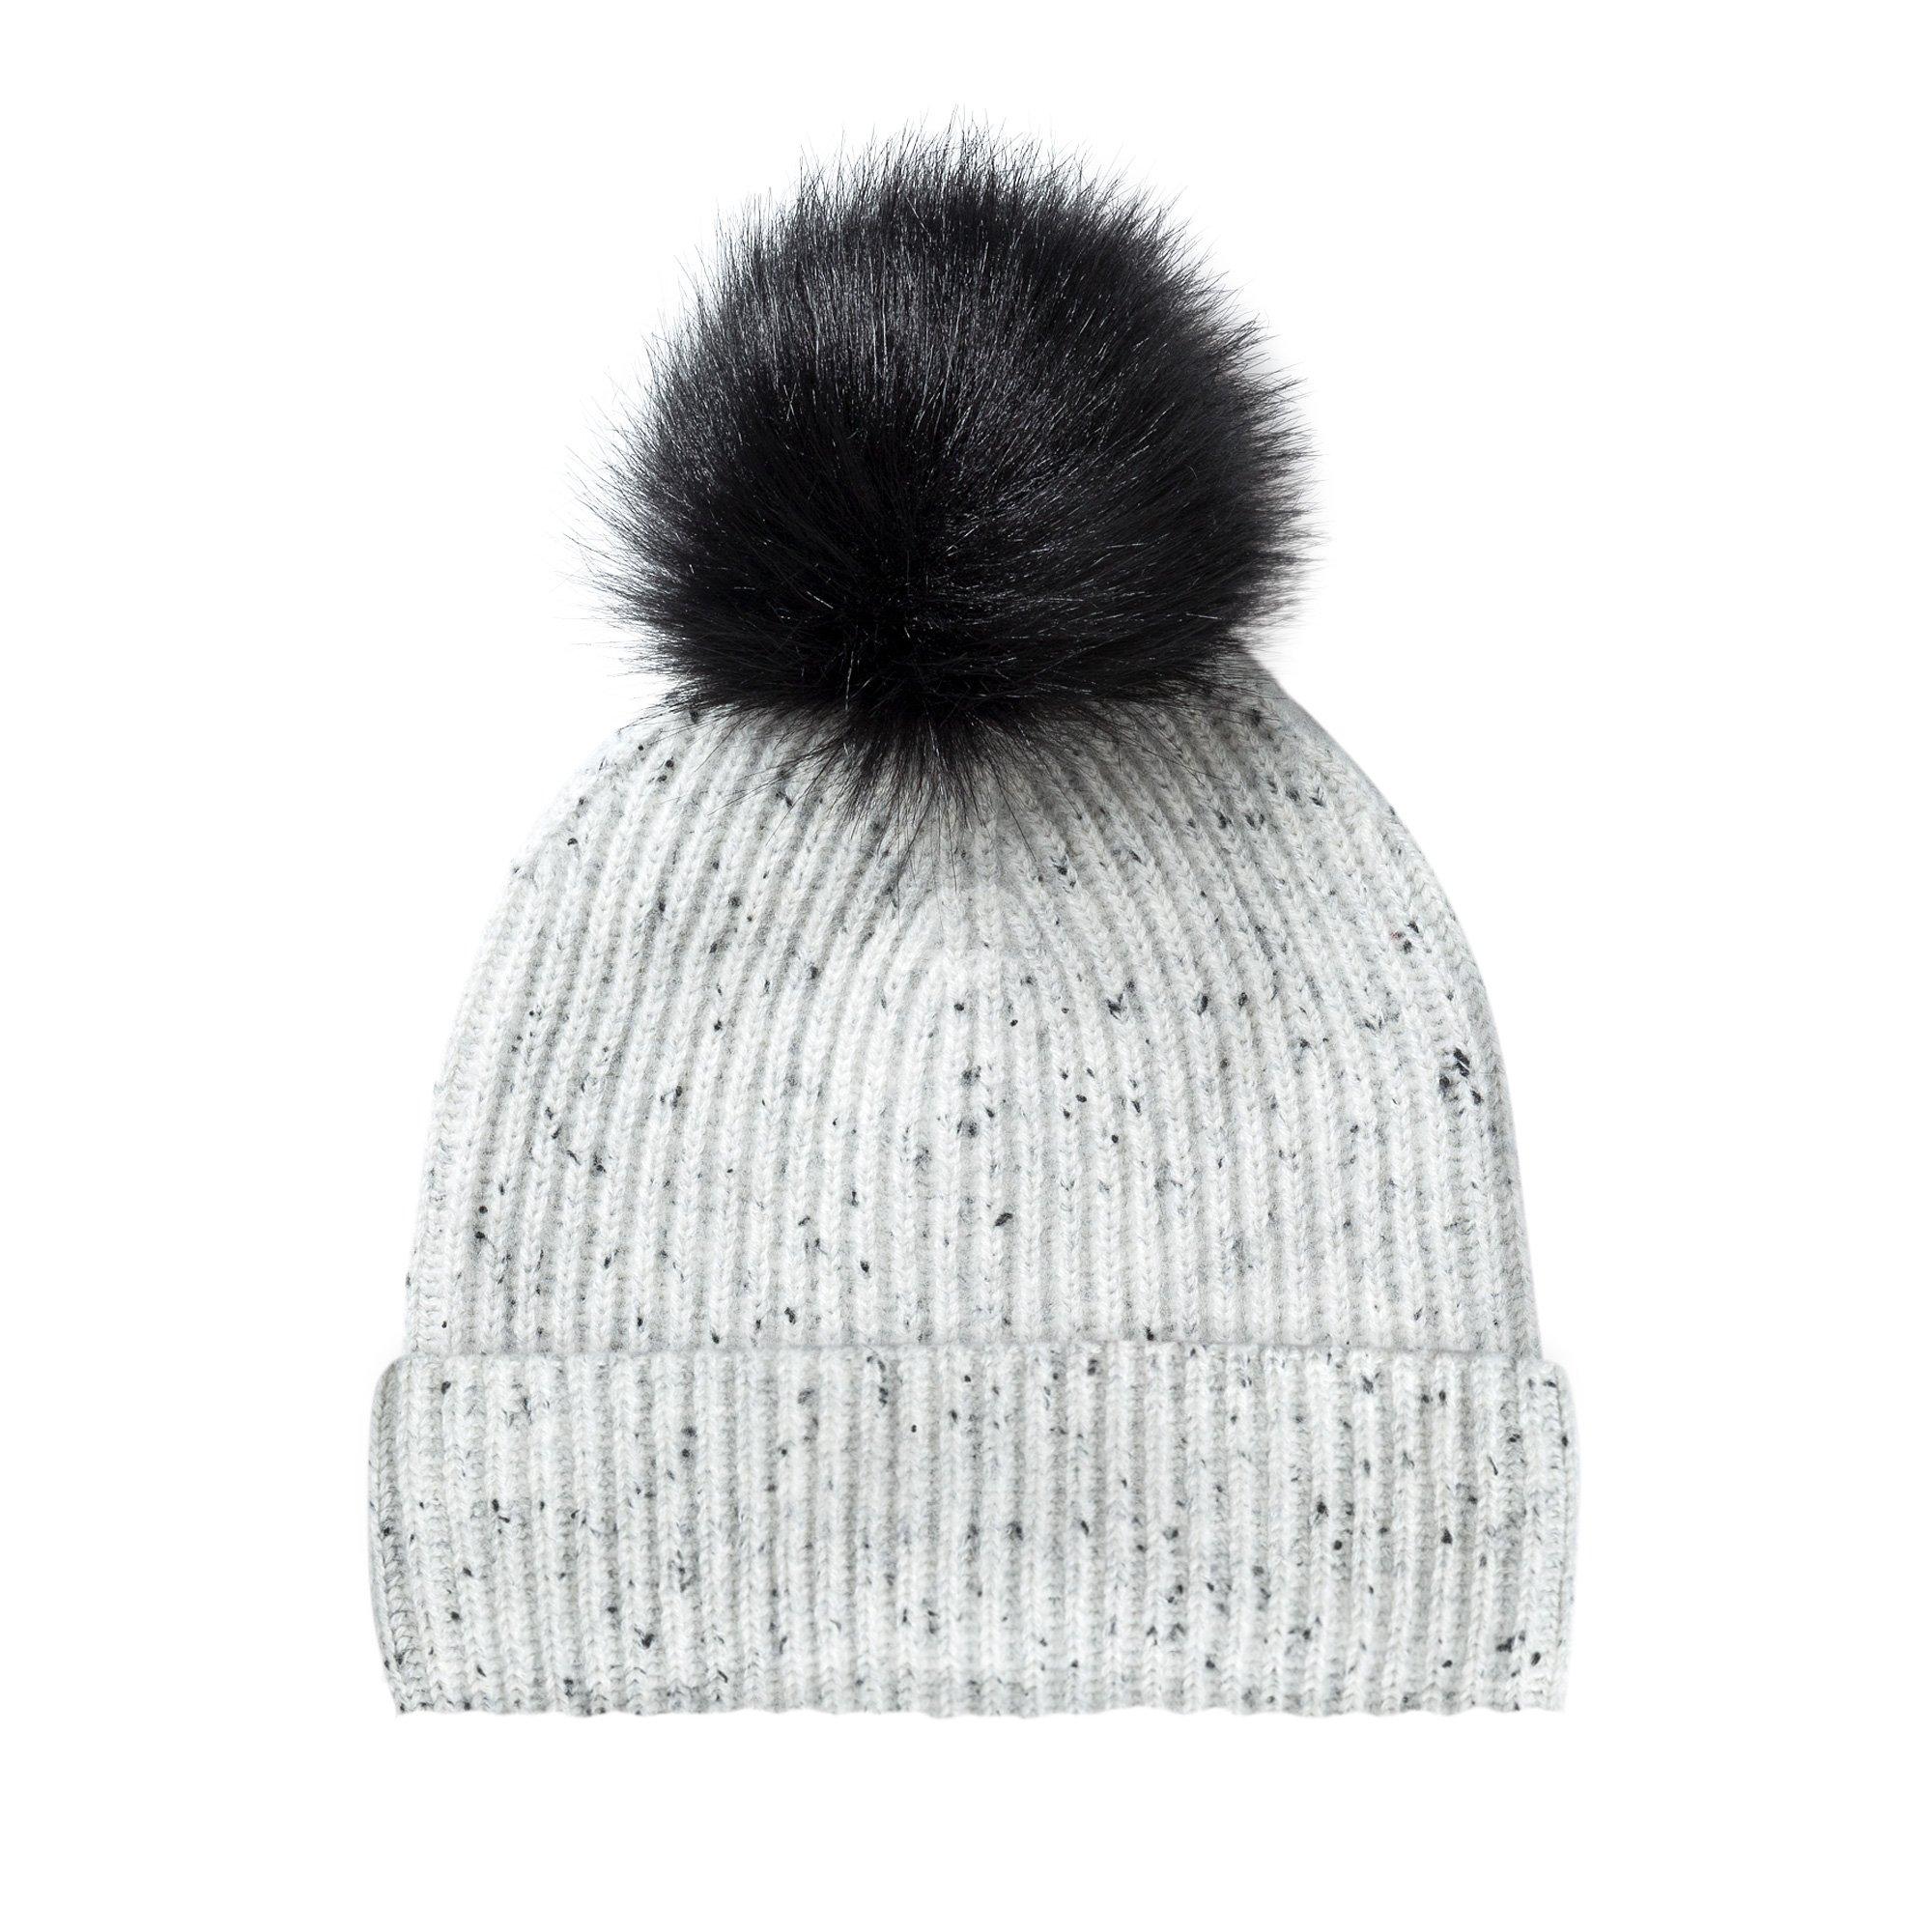 570551b0cbf Cashmere Turn Up Pom Pom Hat